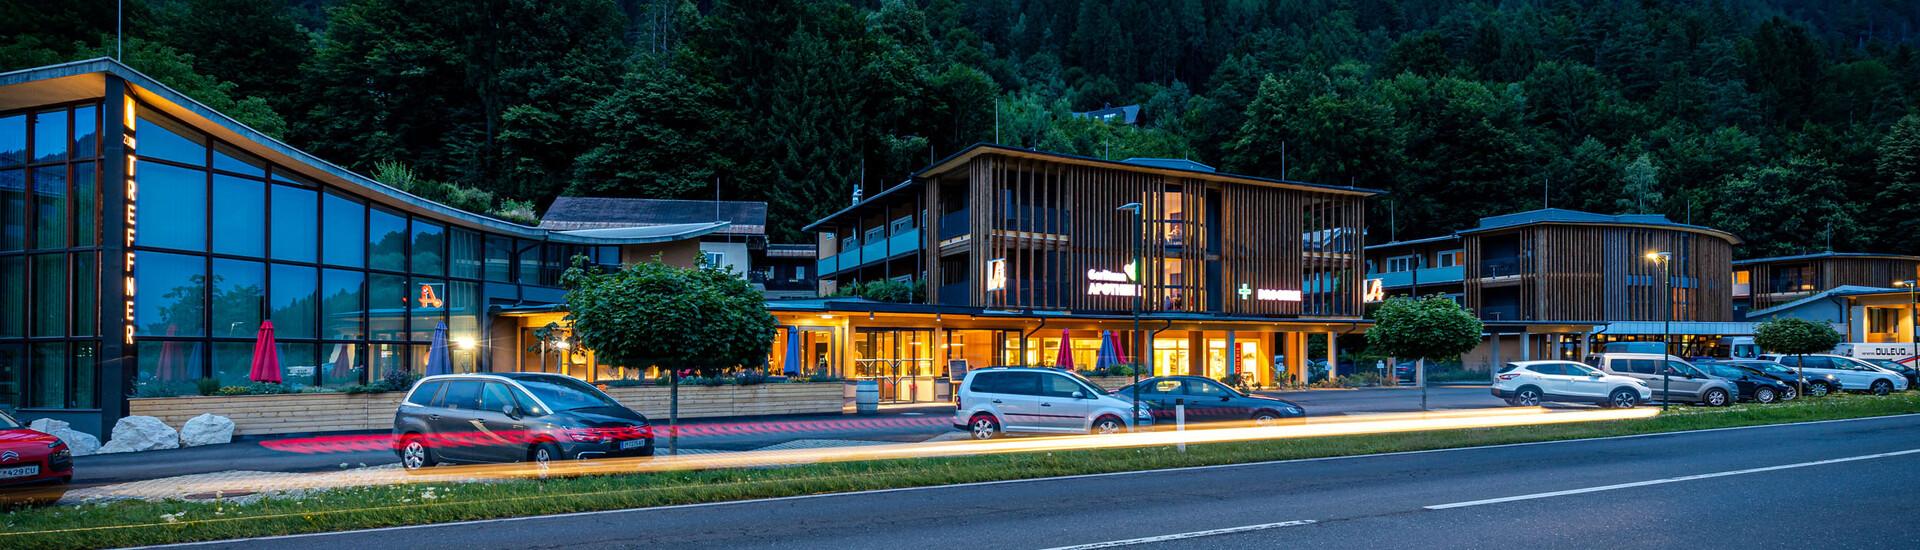 Das beleuchtete 4-Sterne Hotel eduCARE in Treffen am Ossiacher See